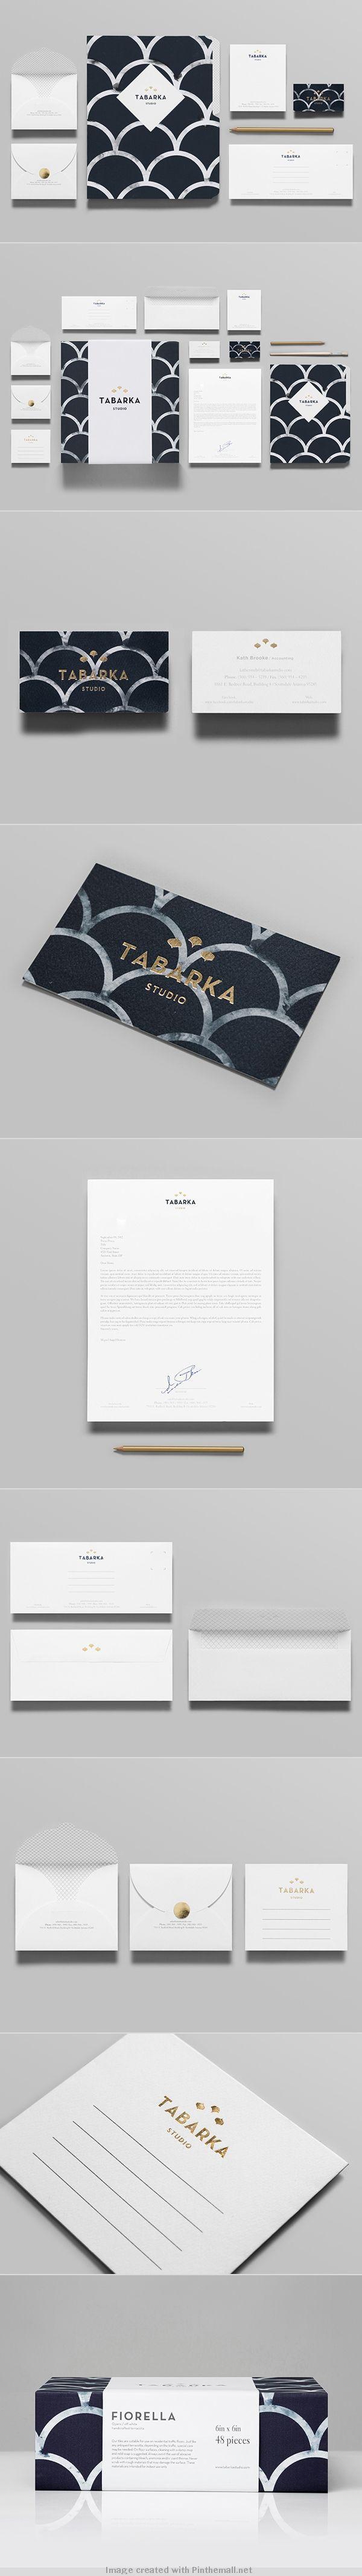 Tabarka Studio | Anagrama